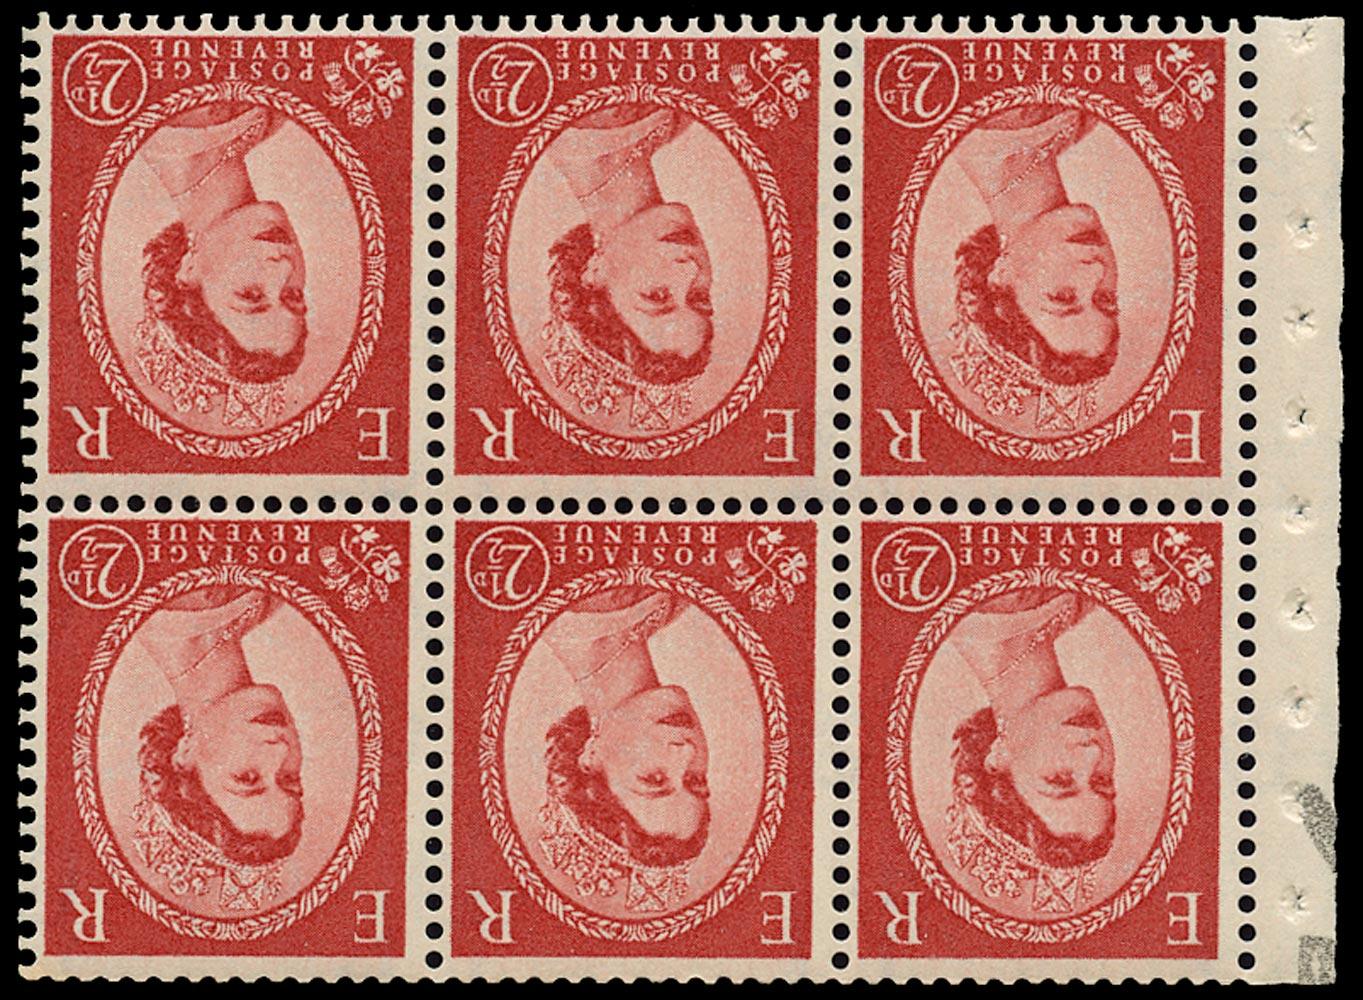 GB 1959  SG591lWi Booklet pane - Wmk. Crowns inverted, Graphite lines